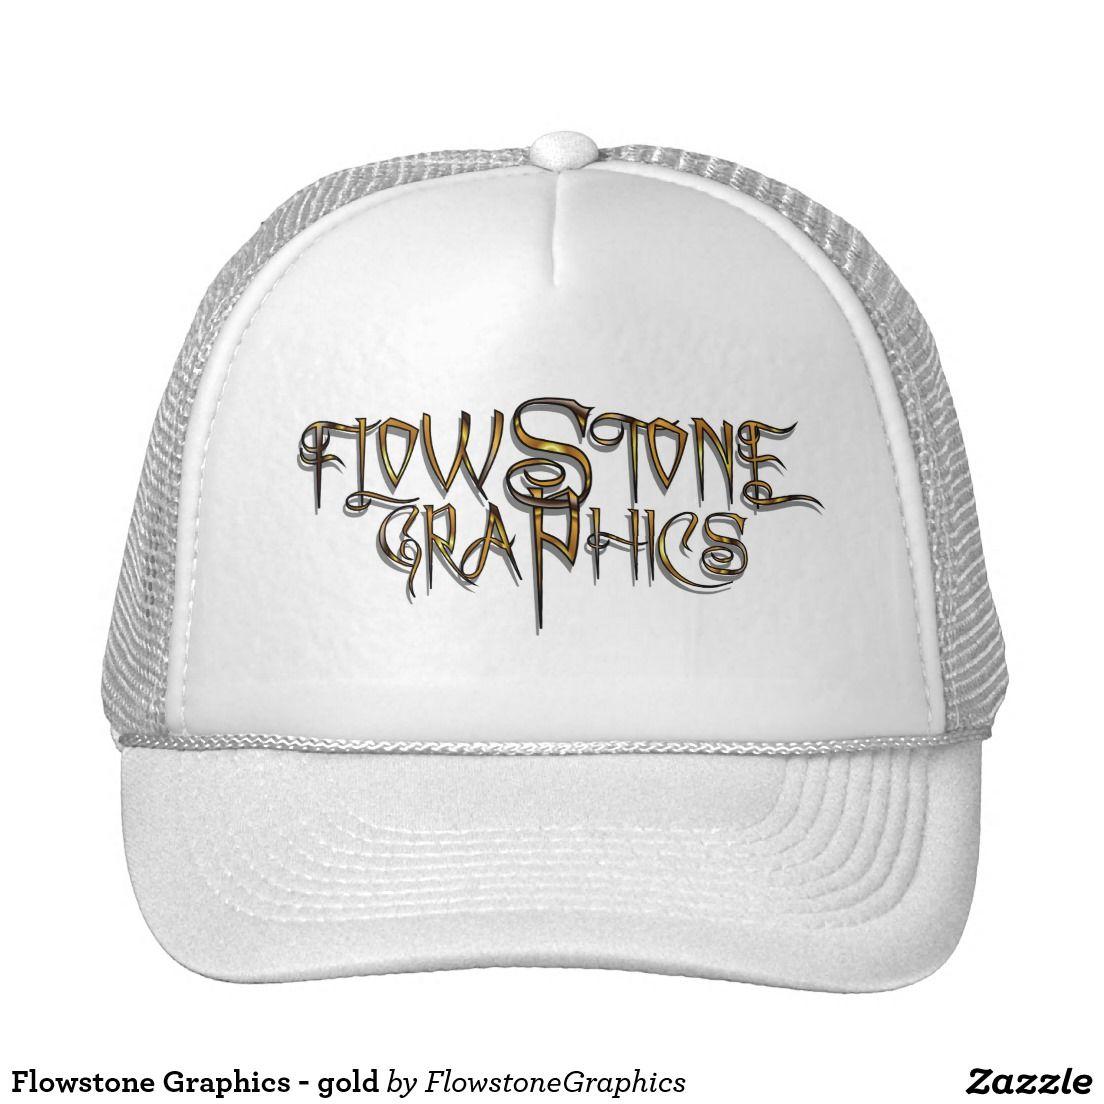 Flowstone Graphics - gold Trucker Hat